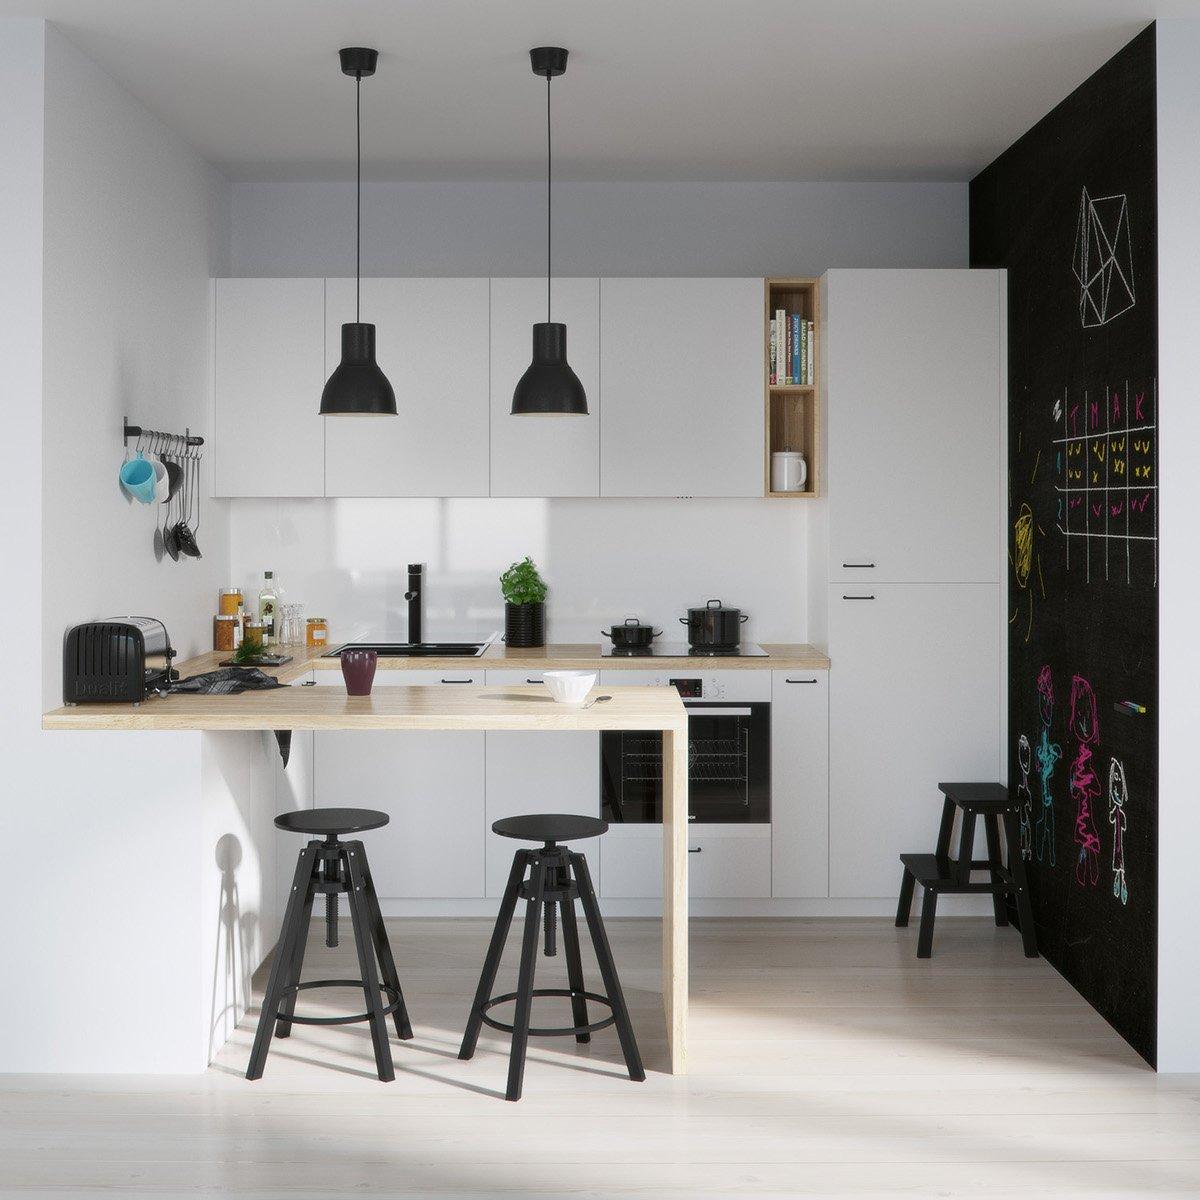 cucina-a-vista-piccola